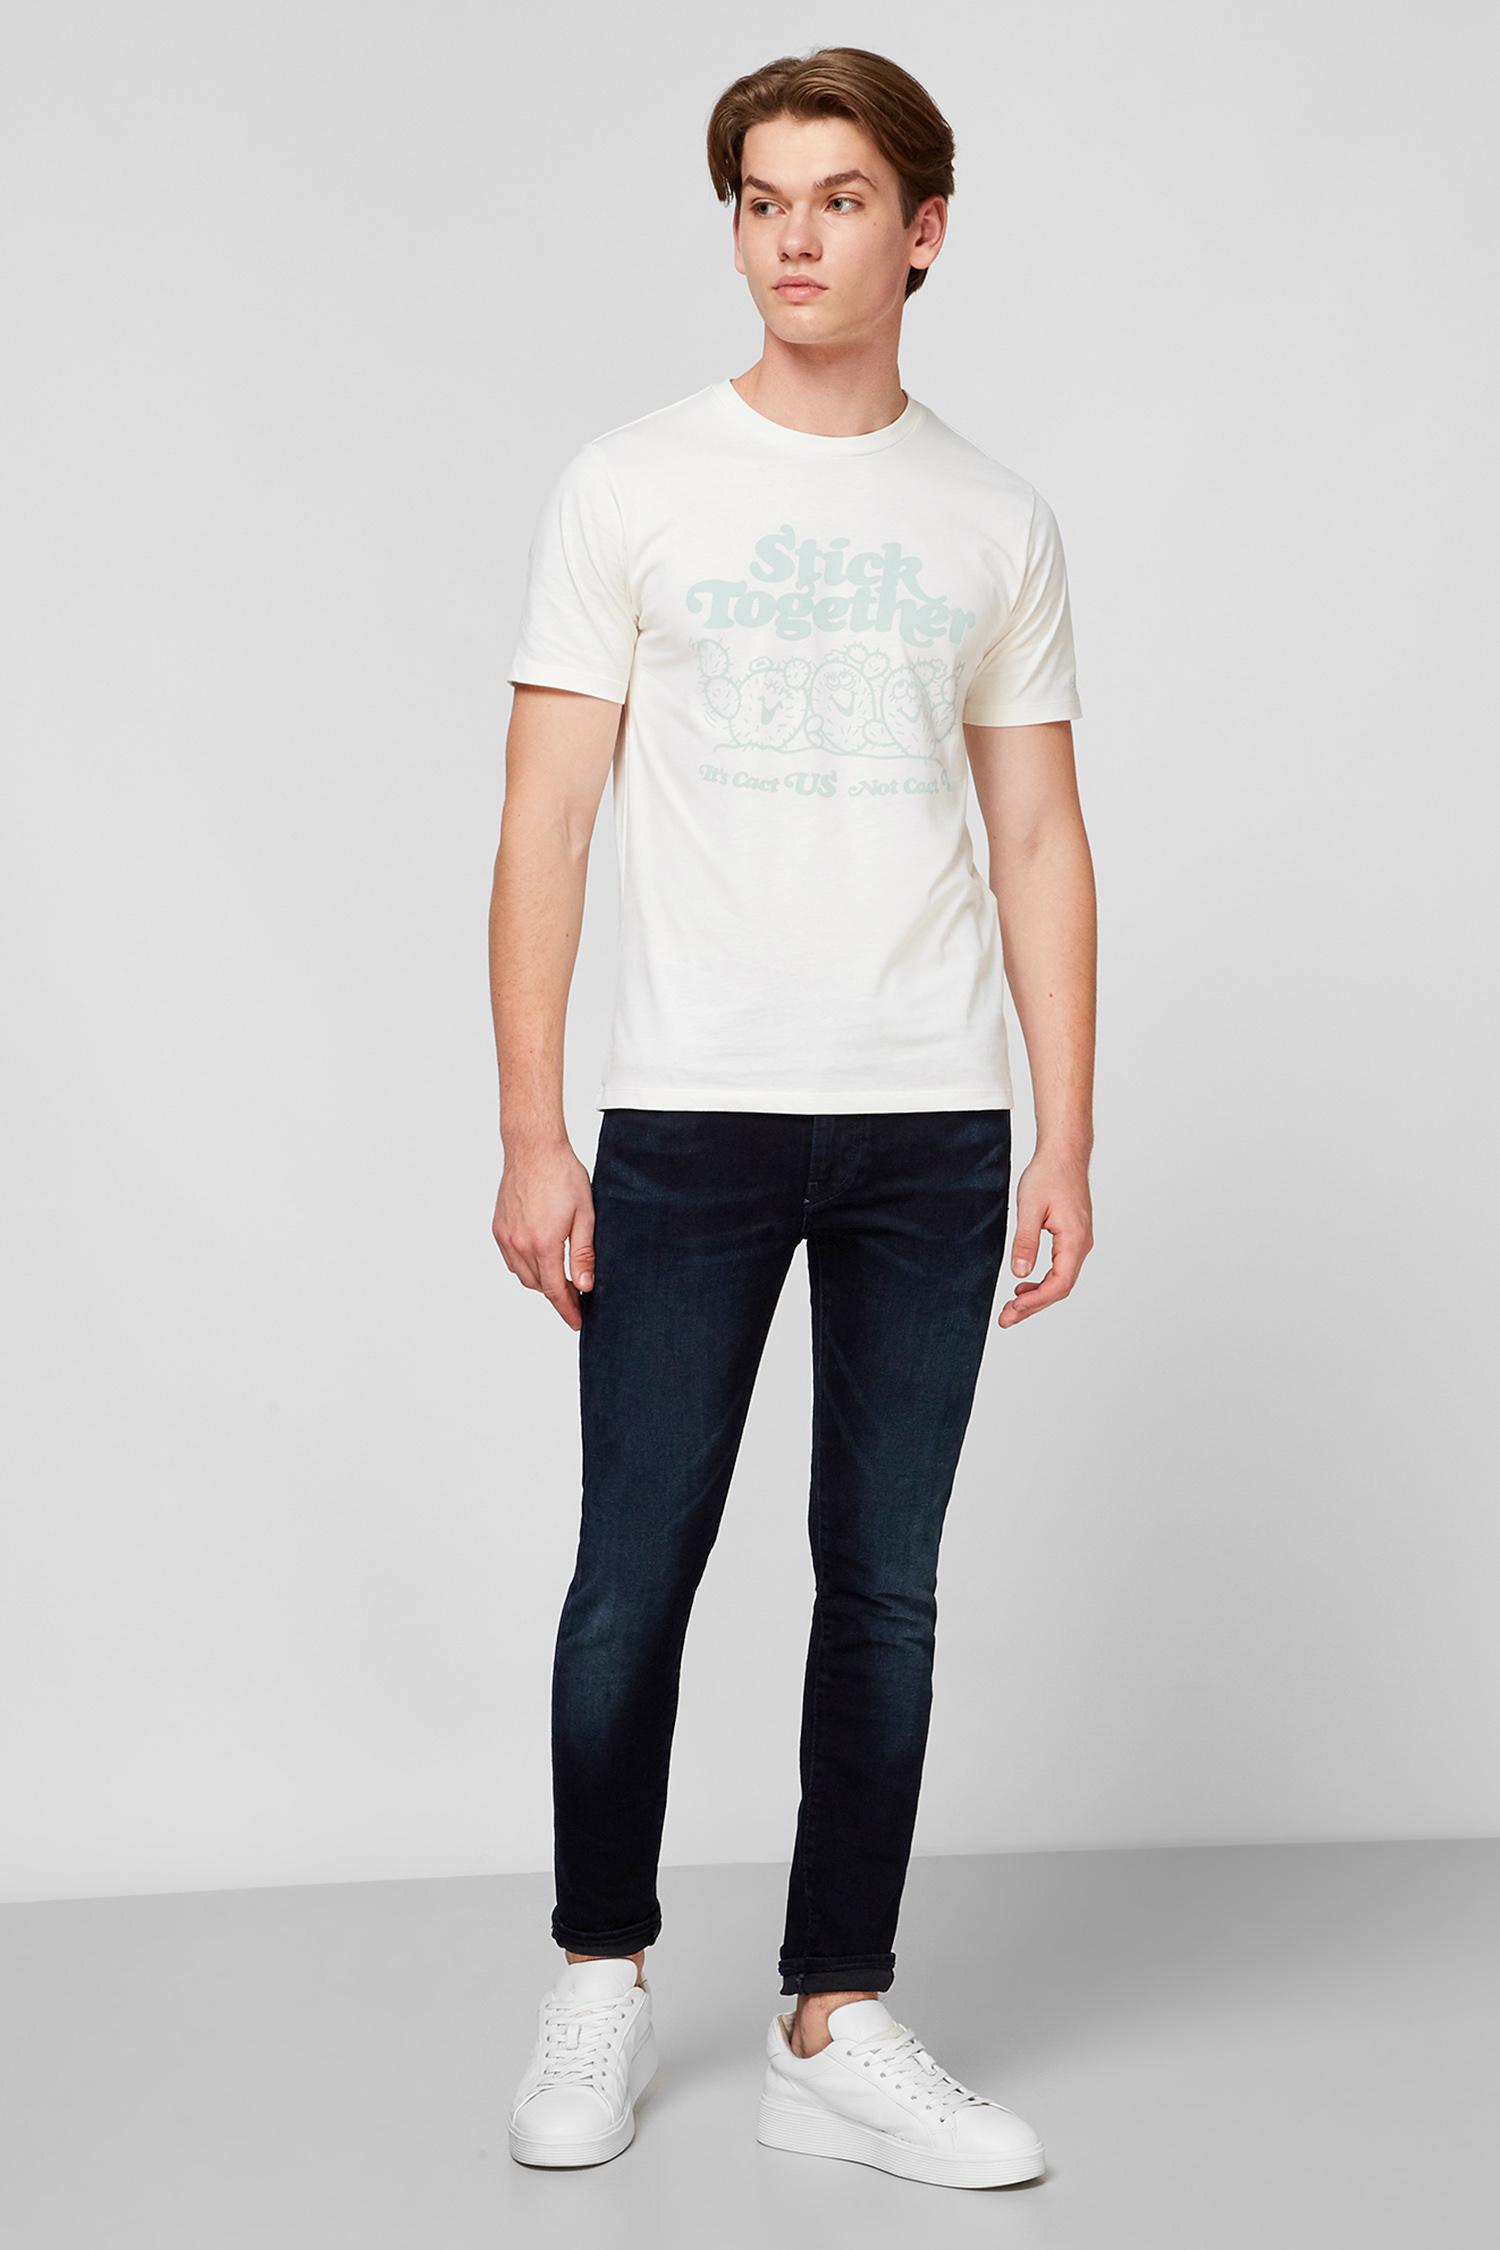 Темно-синие джинсы Skinny Taper для парней Levi's 84558;0017